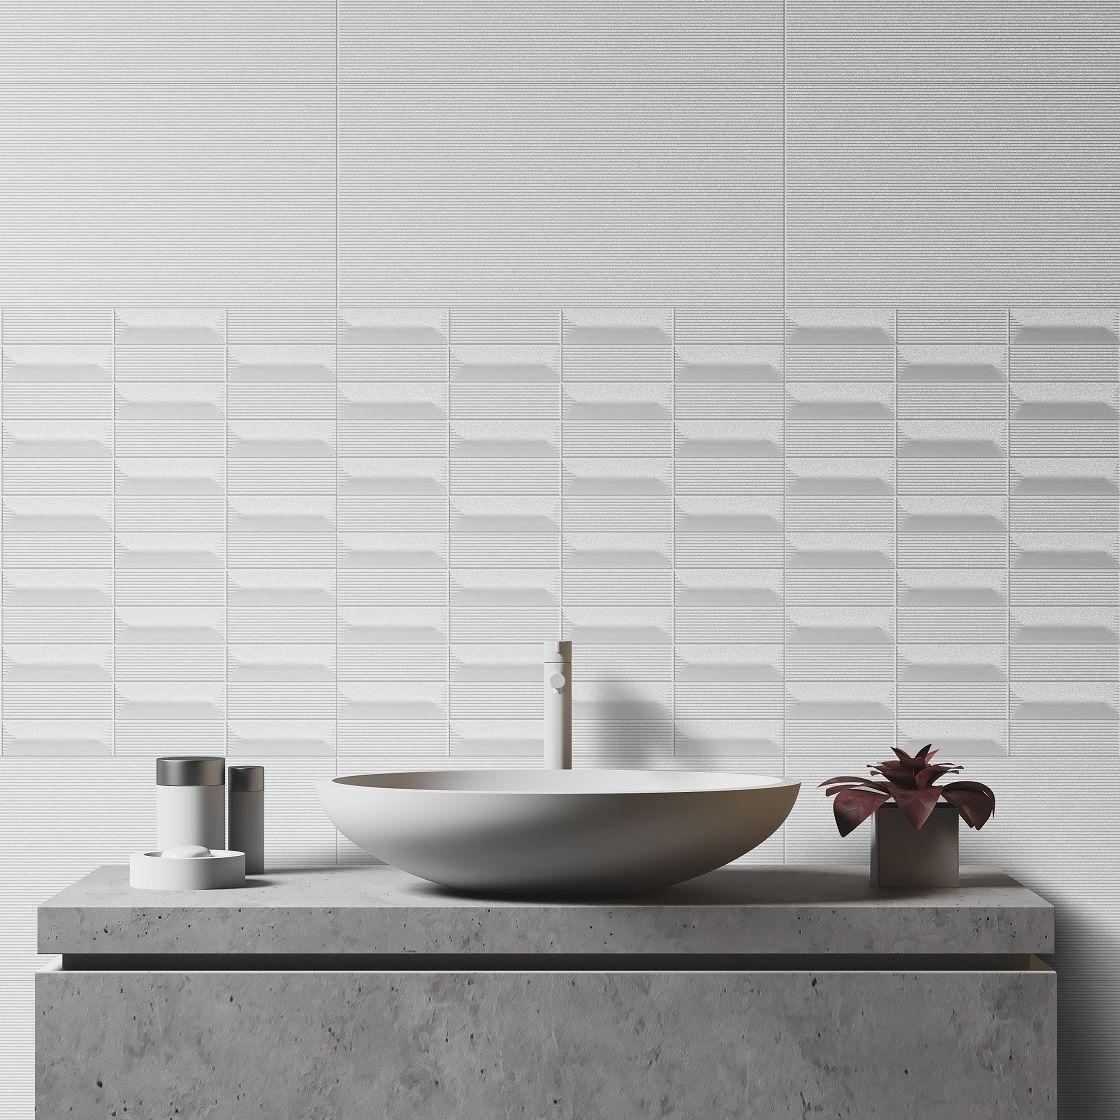 Bathroom Tile Ideas | EQUINOX | Wall Tile, 30X60 cm, Glossy ...